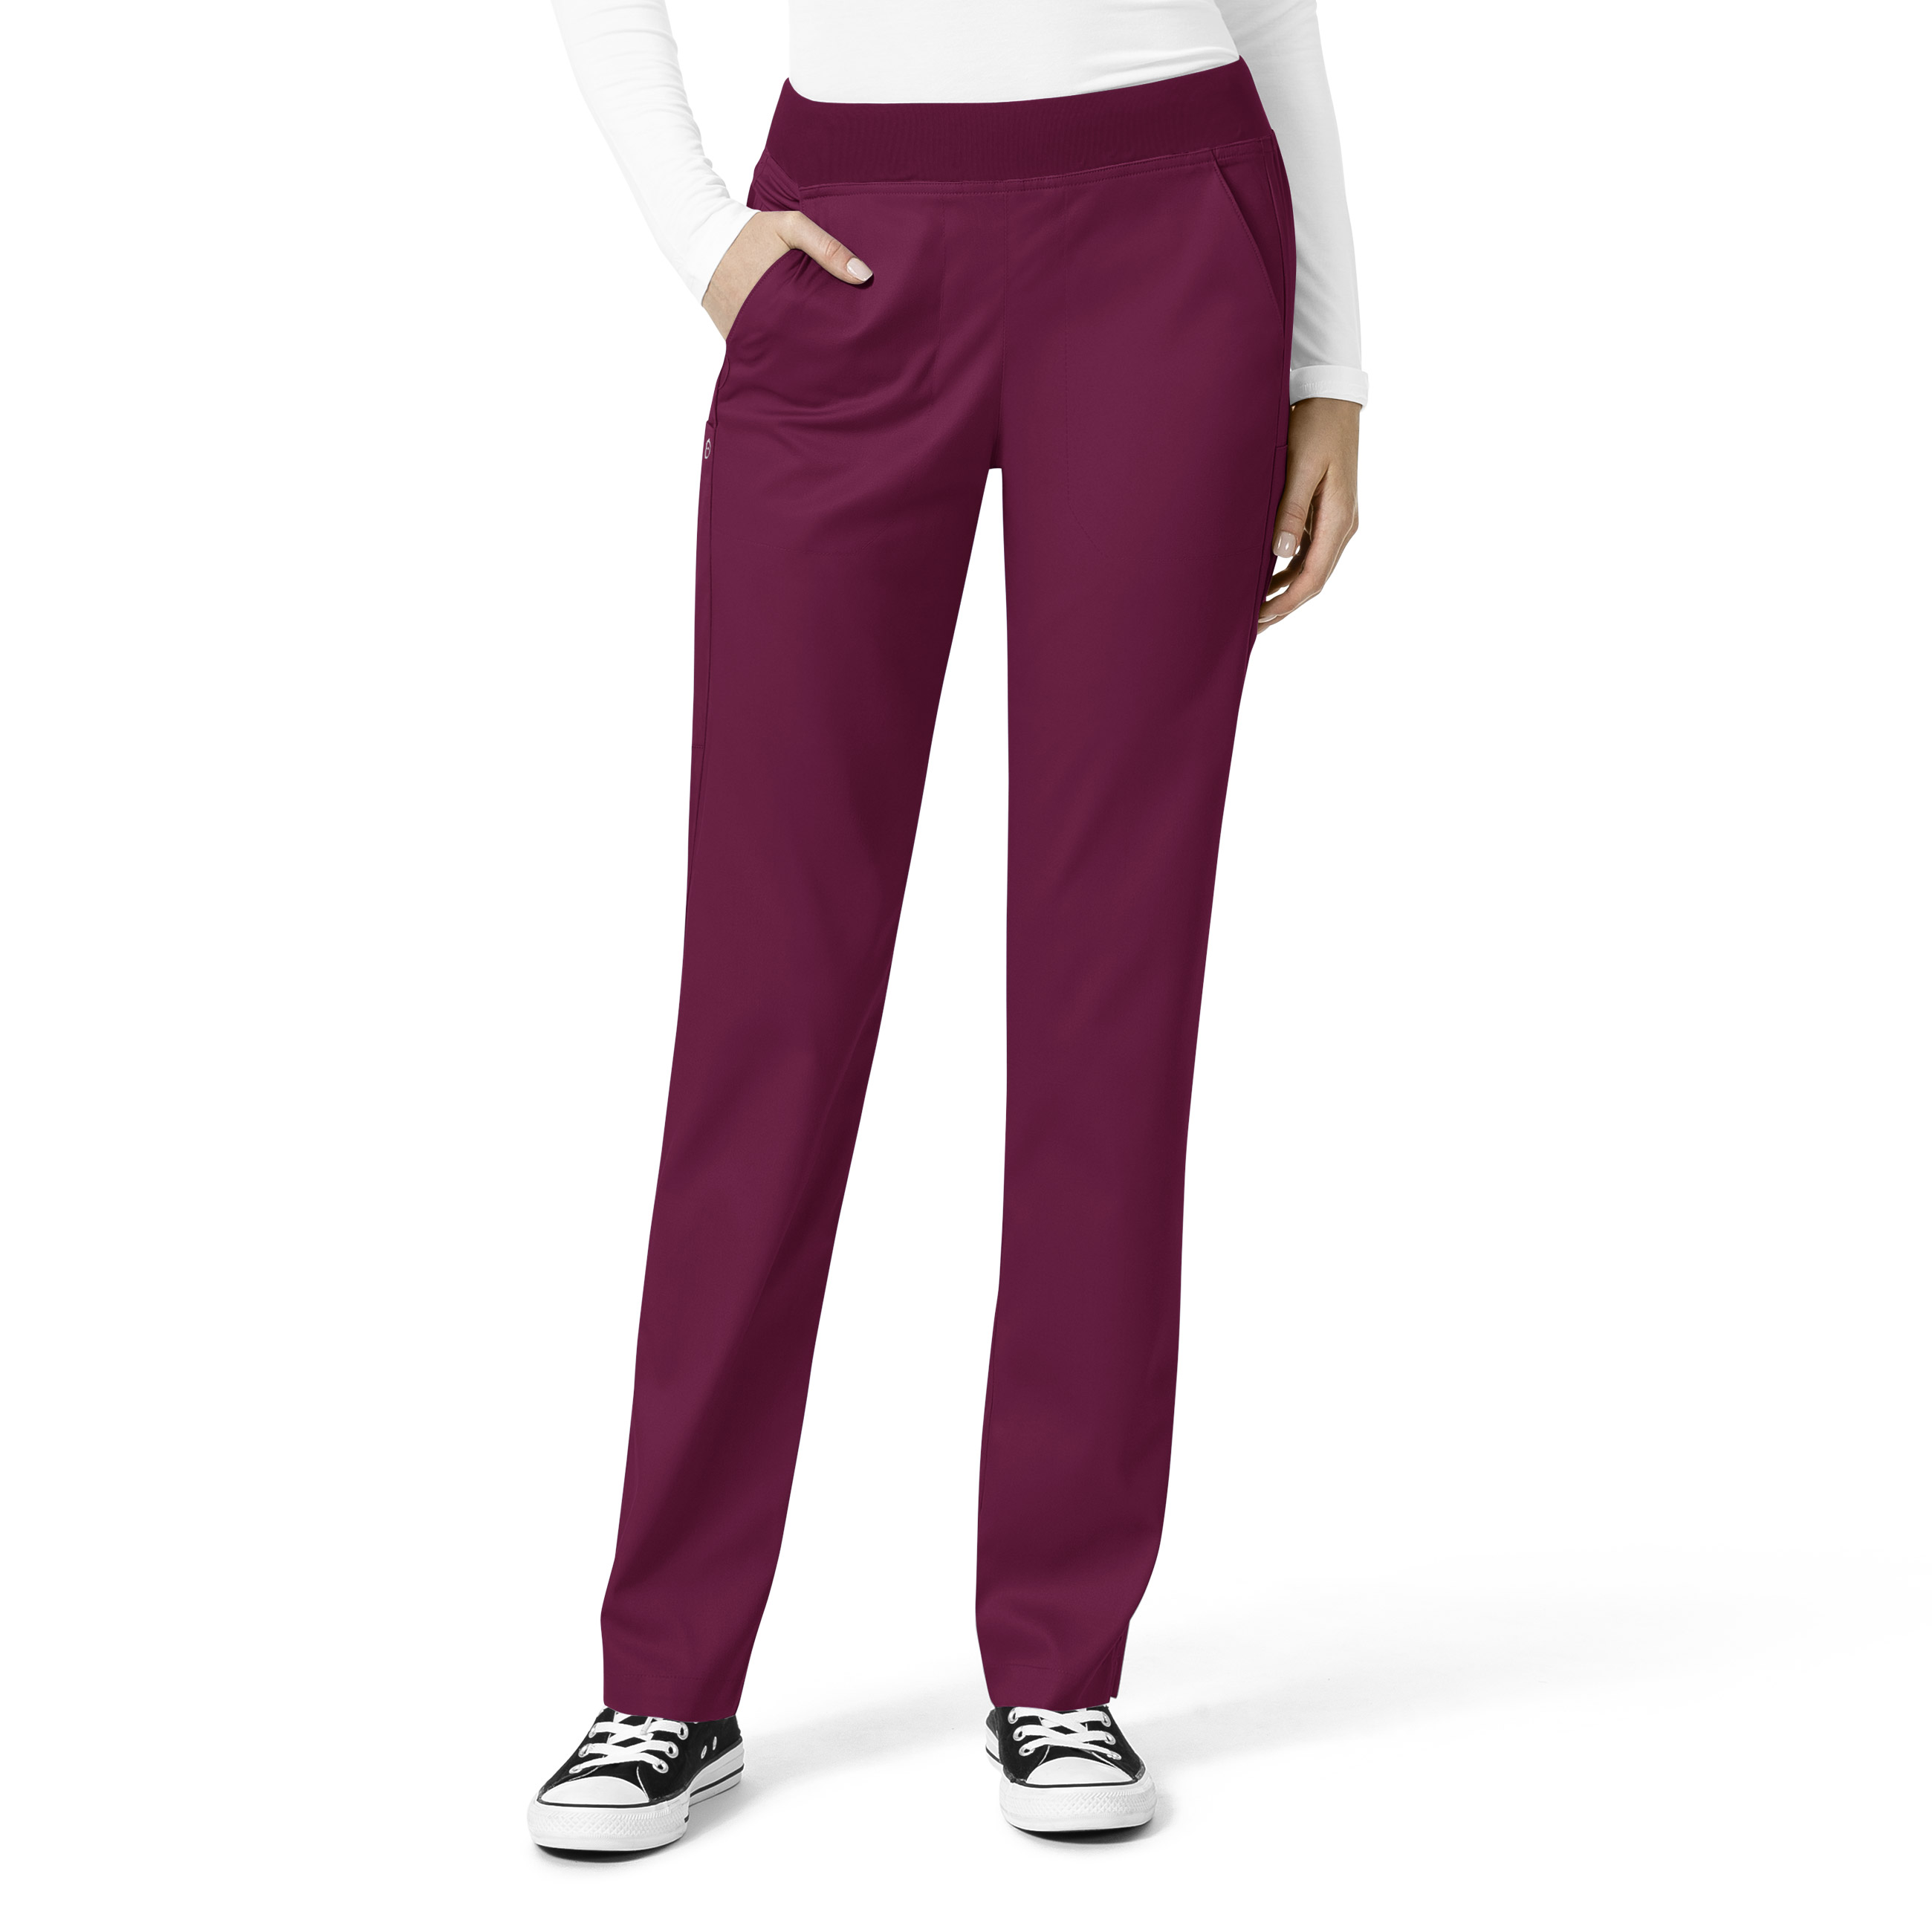 WonderWink PRO Women's Knit Waist Cargo Pant - 5419